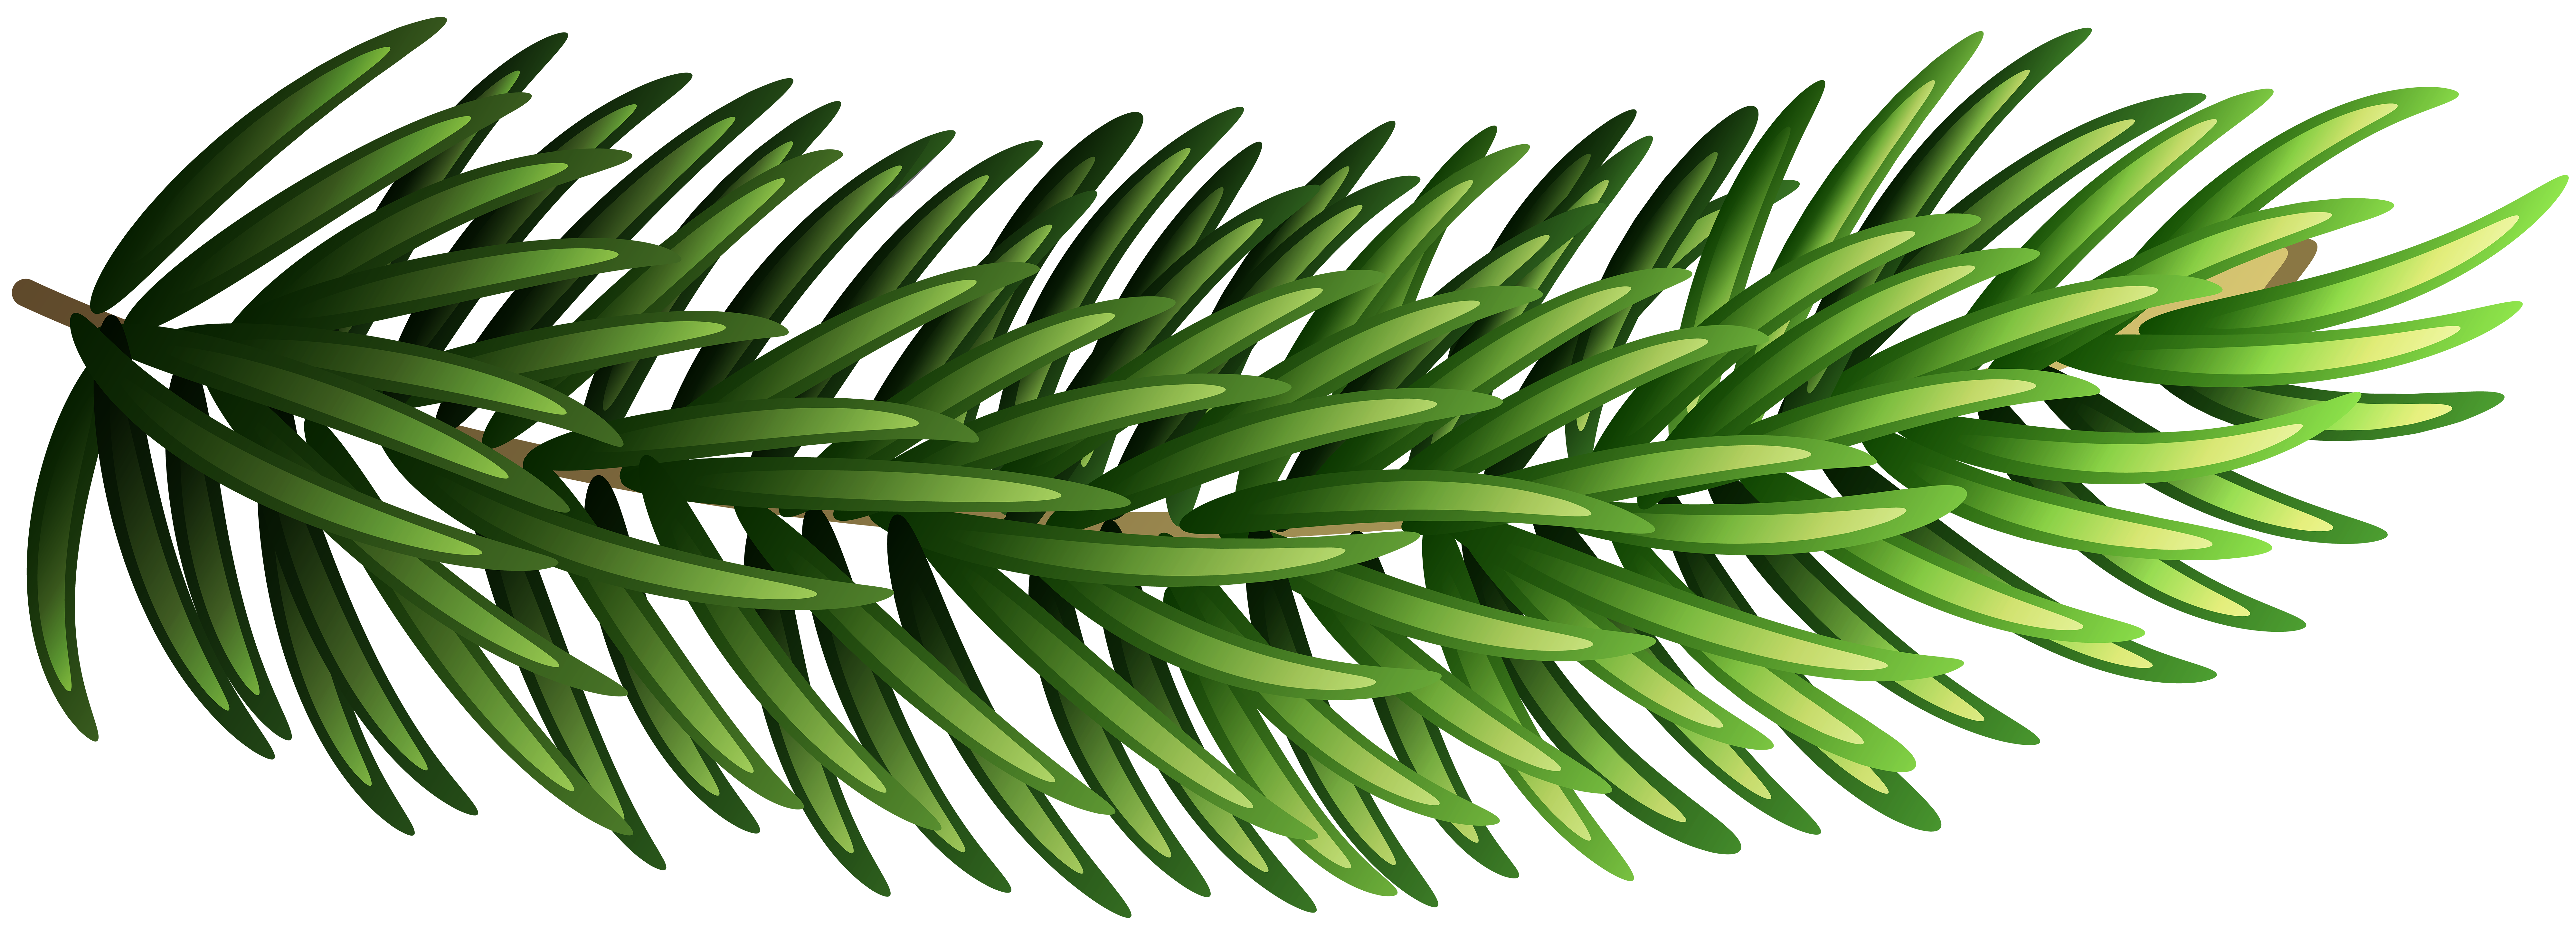 Pomegranate clipart branch. Pine transparent png clip